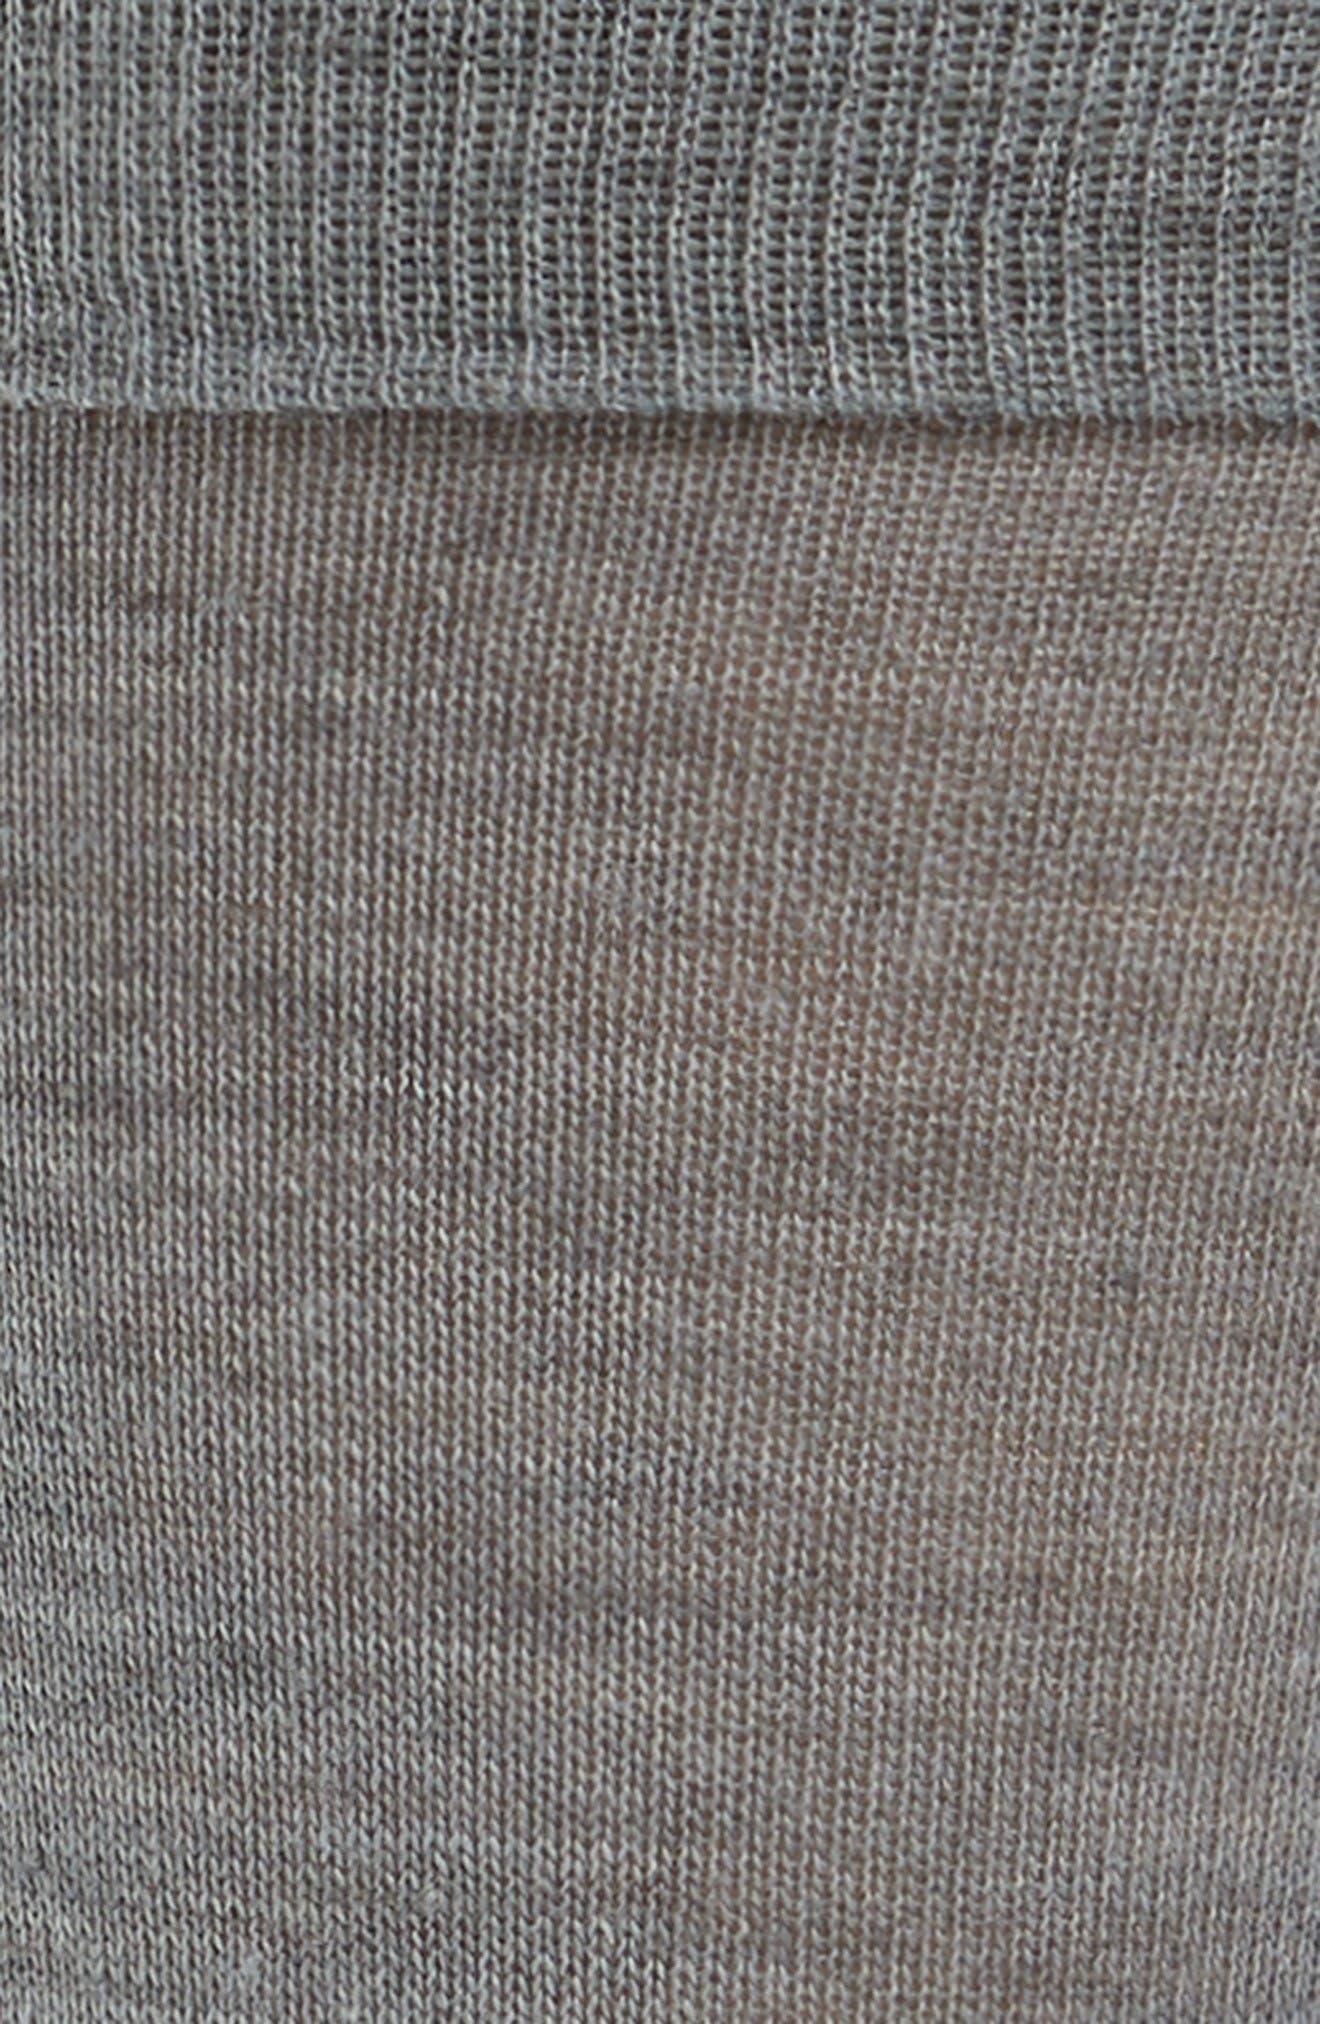 Alternate Image 2  - Lorenzo Uomo Merino Wool Blend Socks (3 for $30)